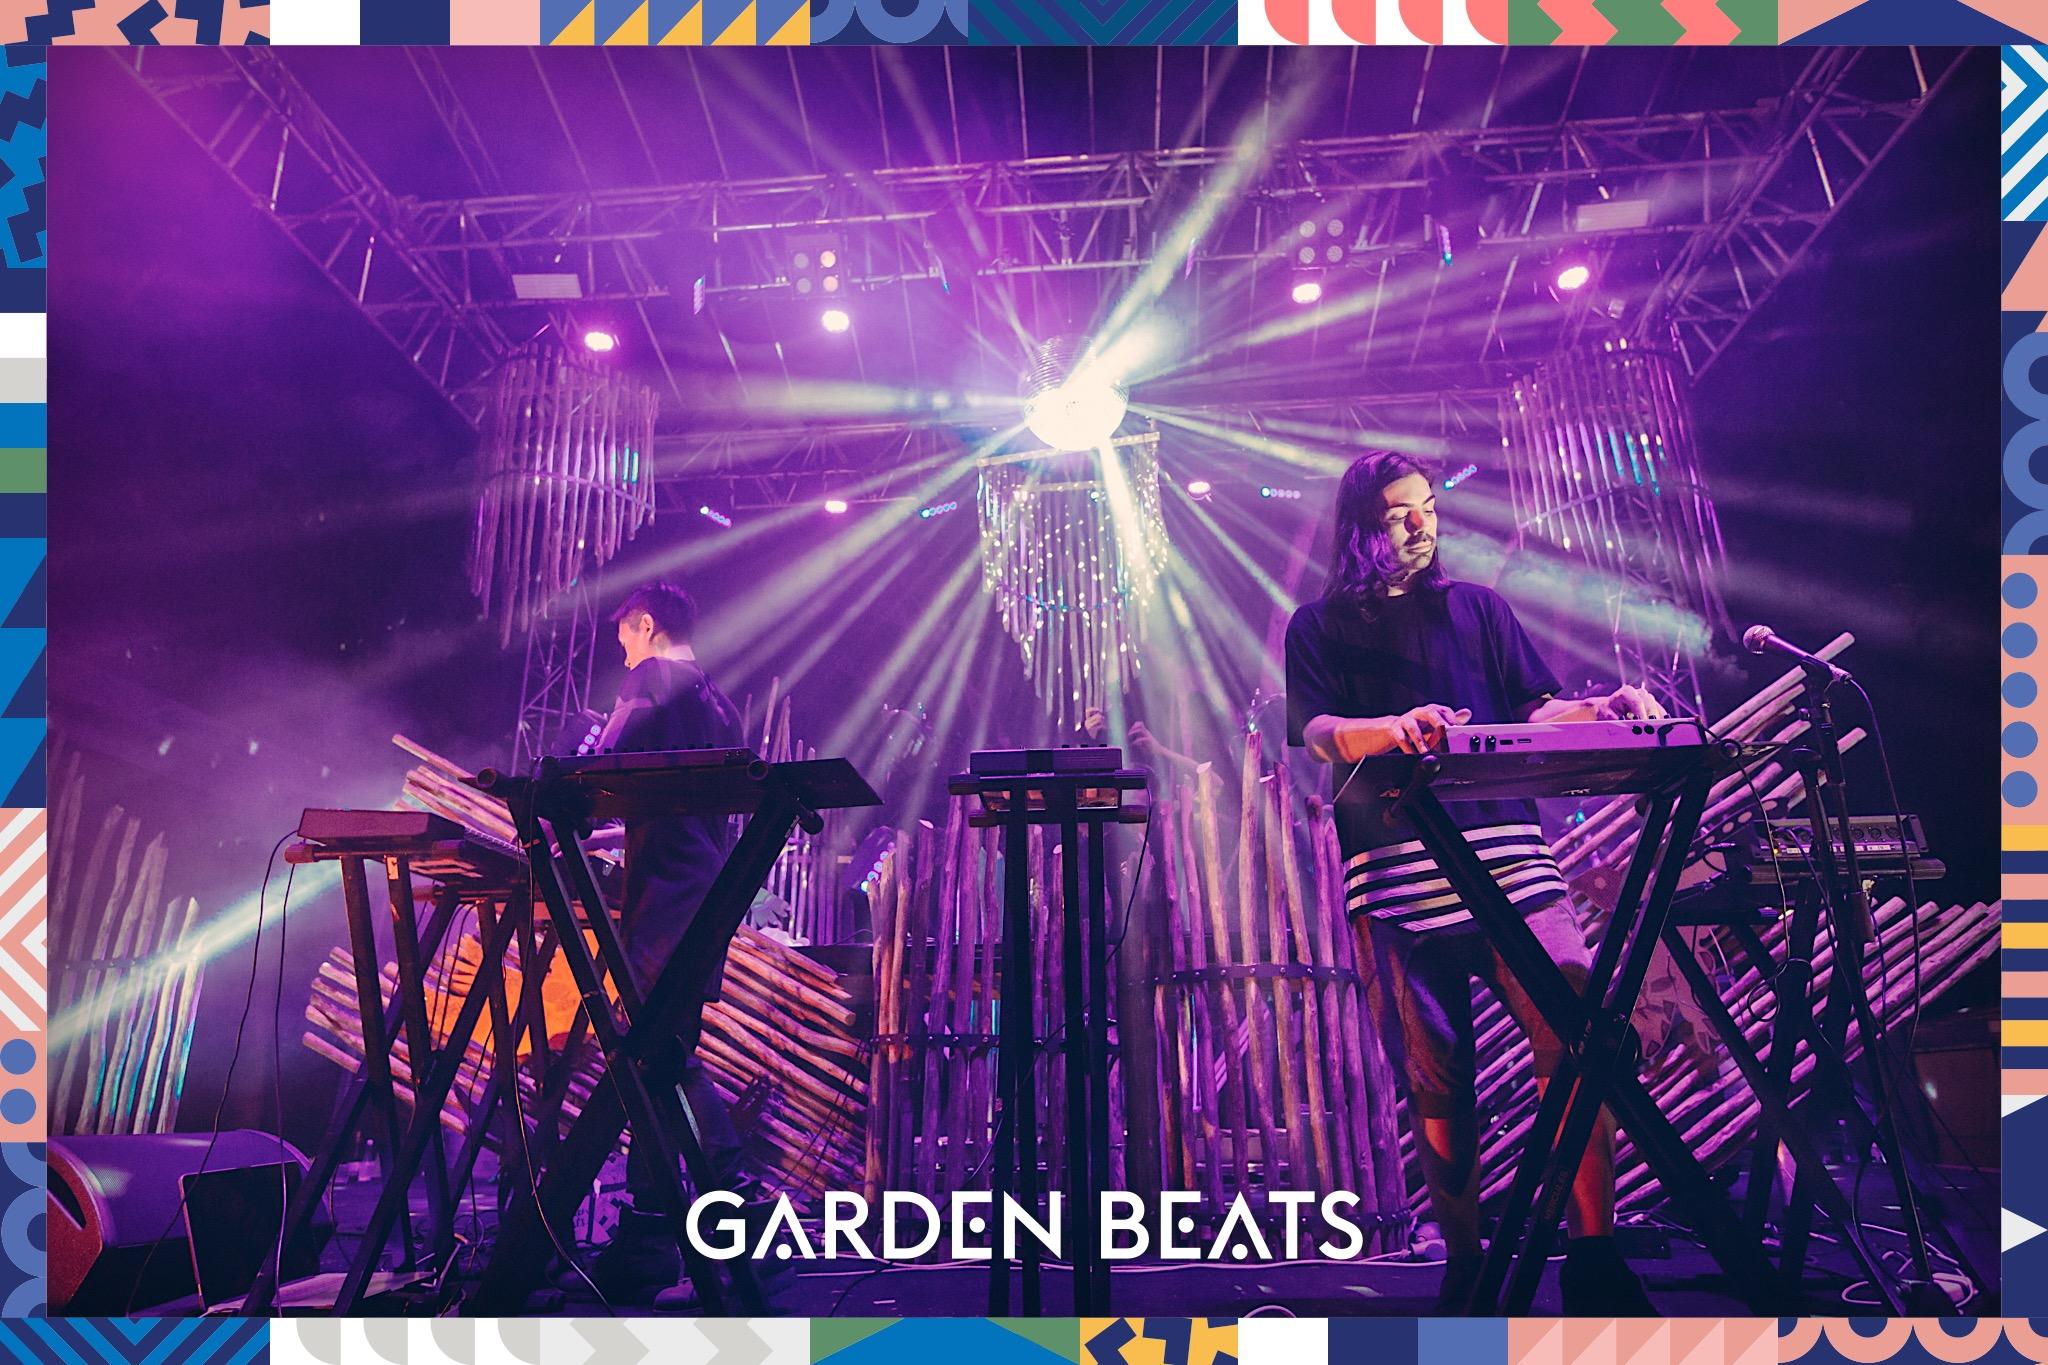 18032017_GardenBeats_Colossal731_WatermarkedGB.jpg